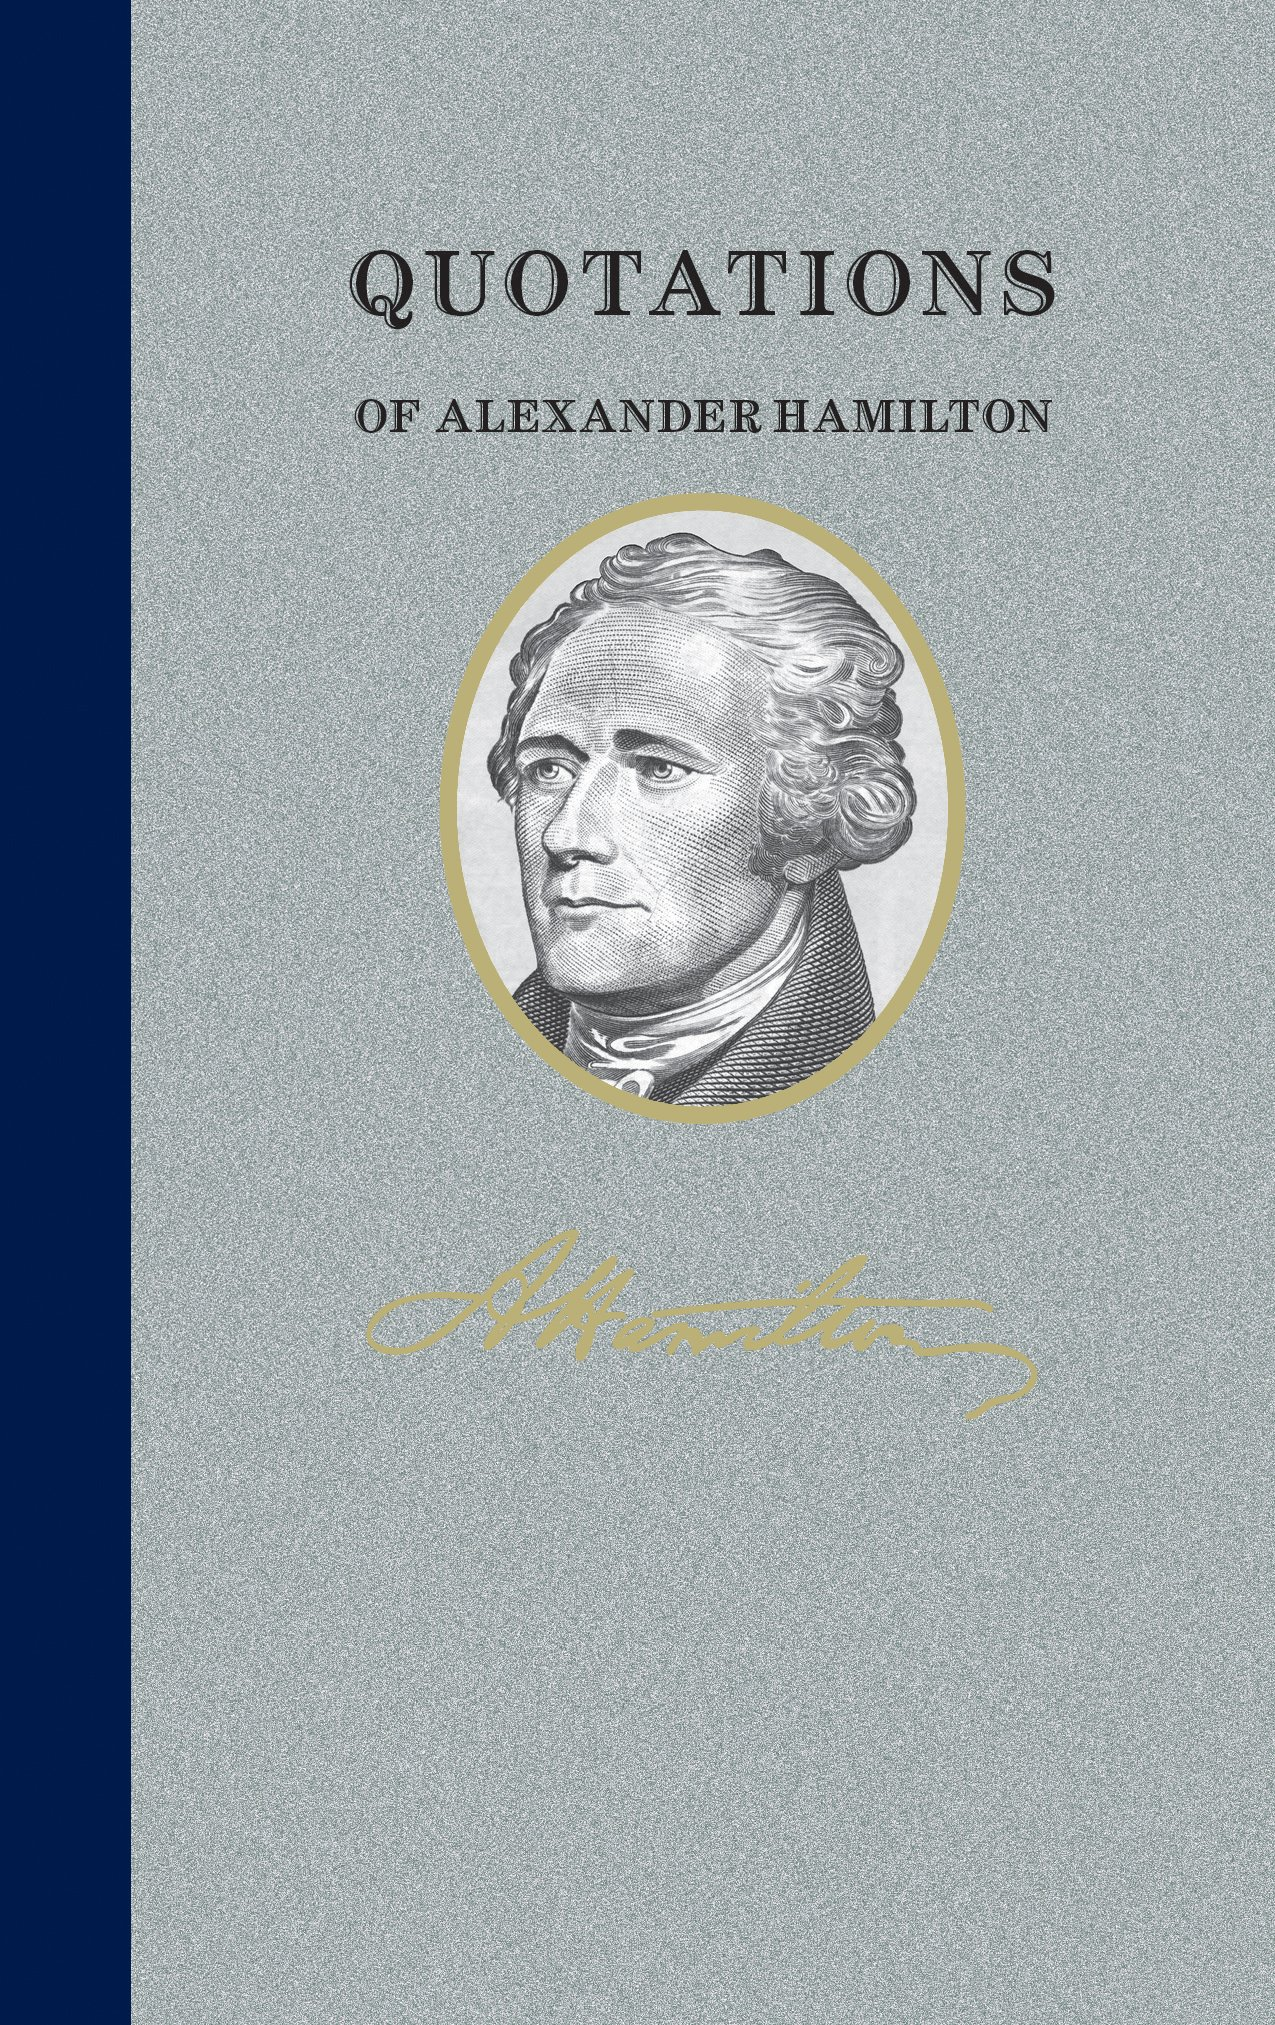 Quotations of Alexander Hamilton: Quote/Unquote